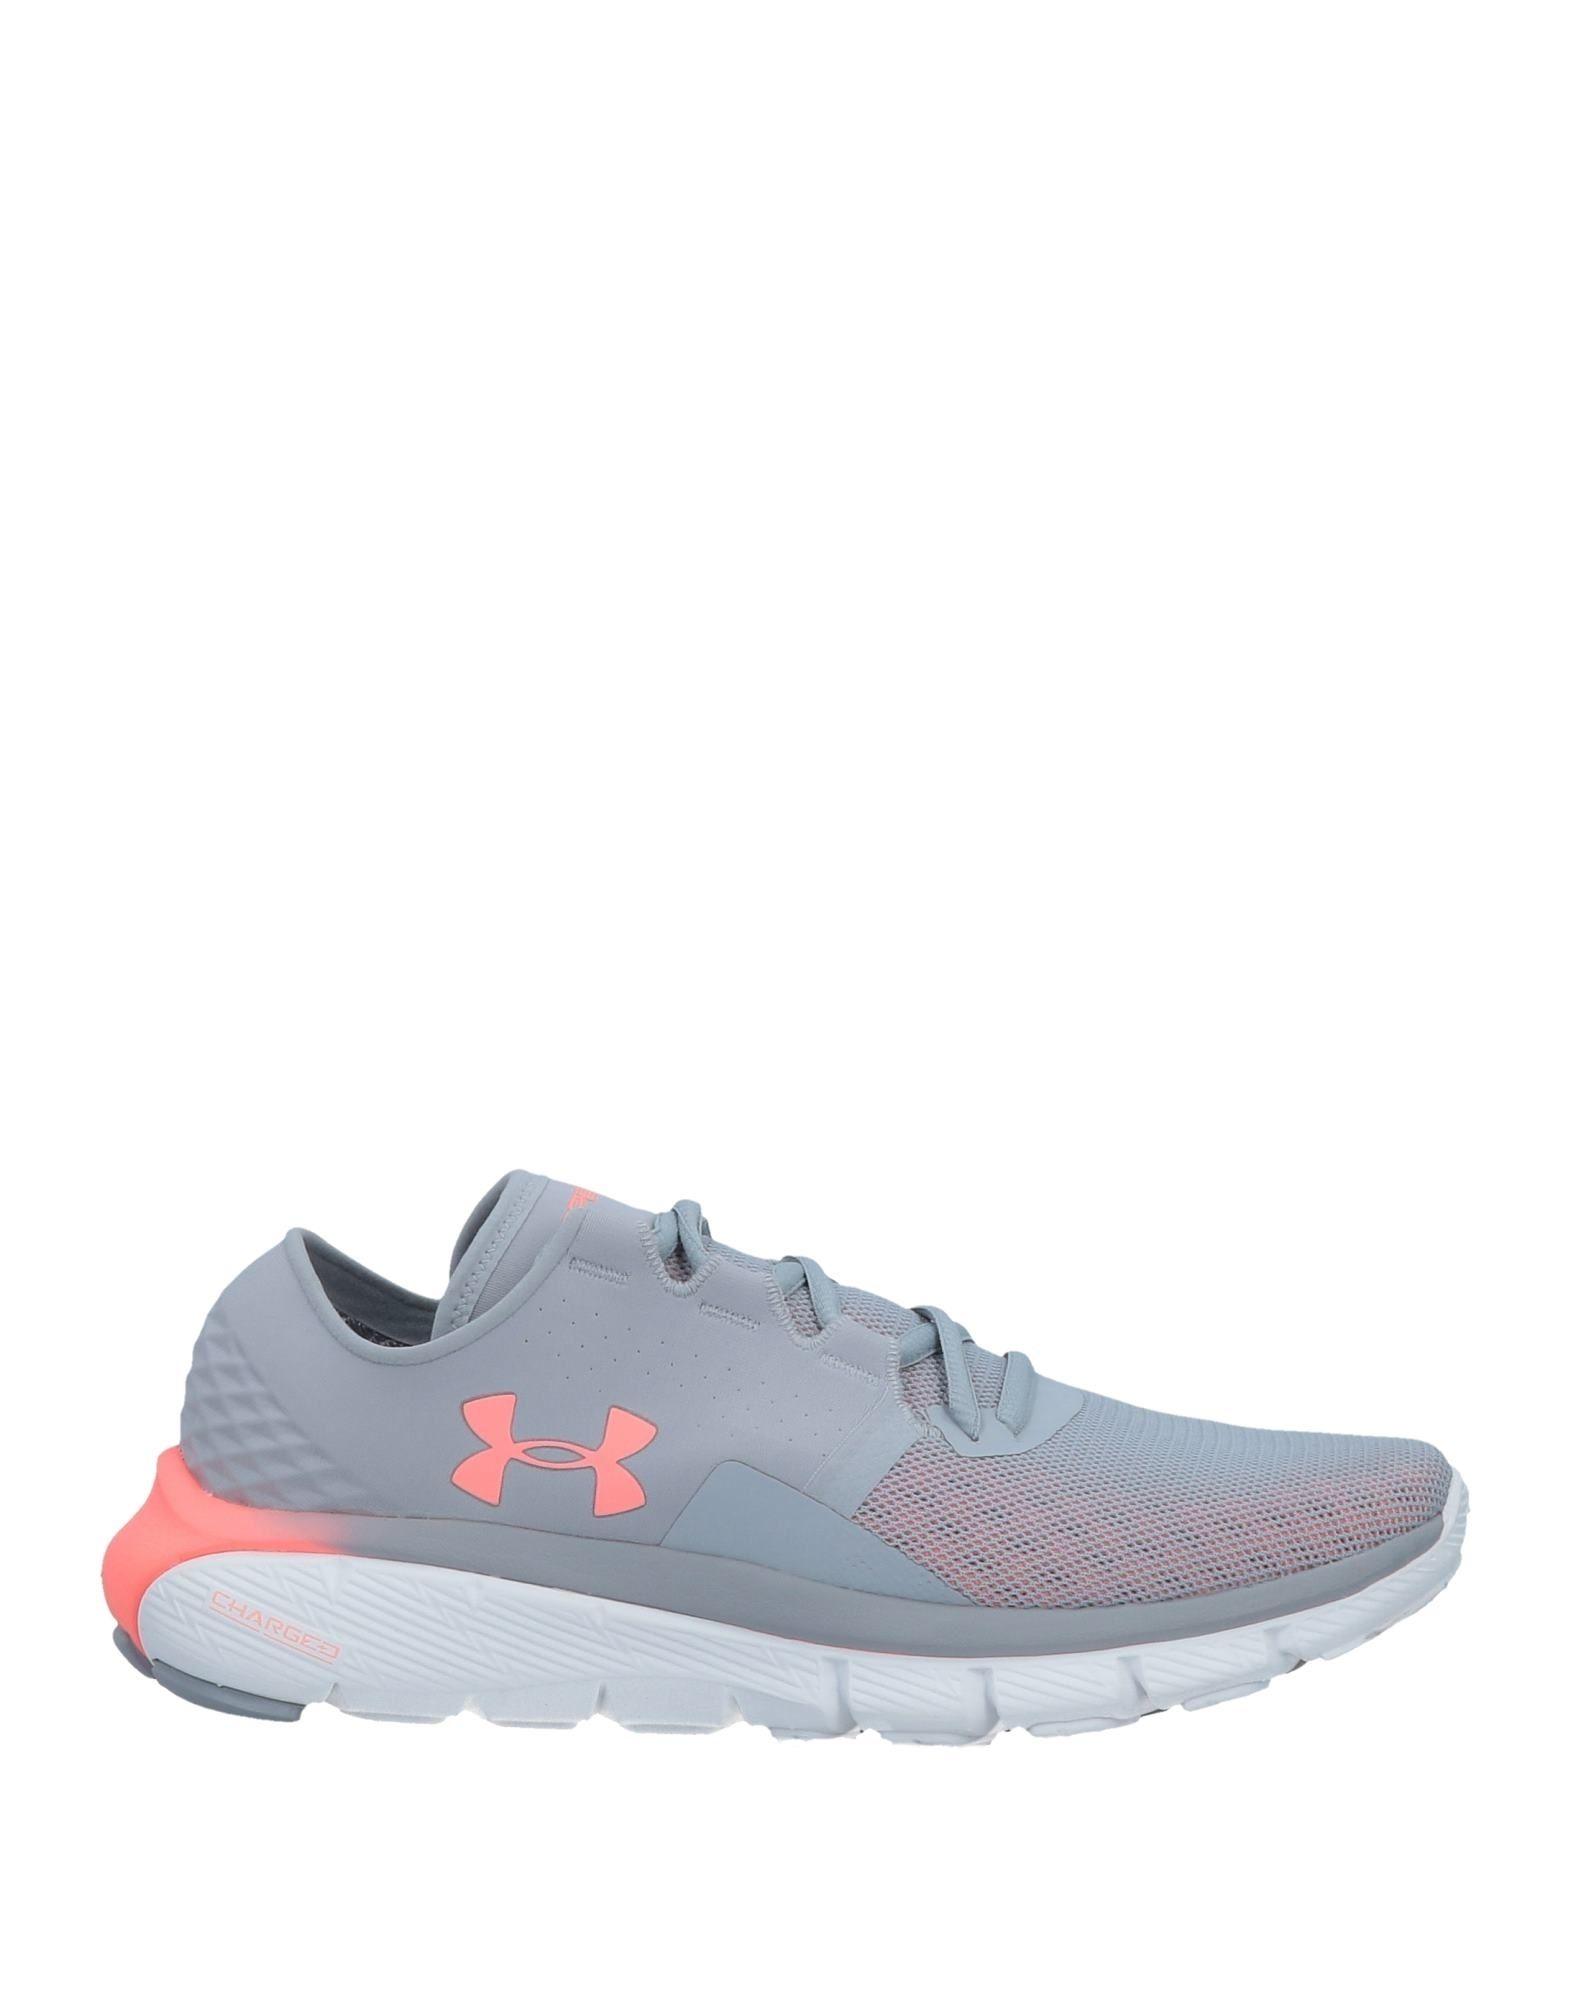 Under Armour Sneakers Damen  11509116TO Gute Qualität beliebte Schuhe